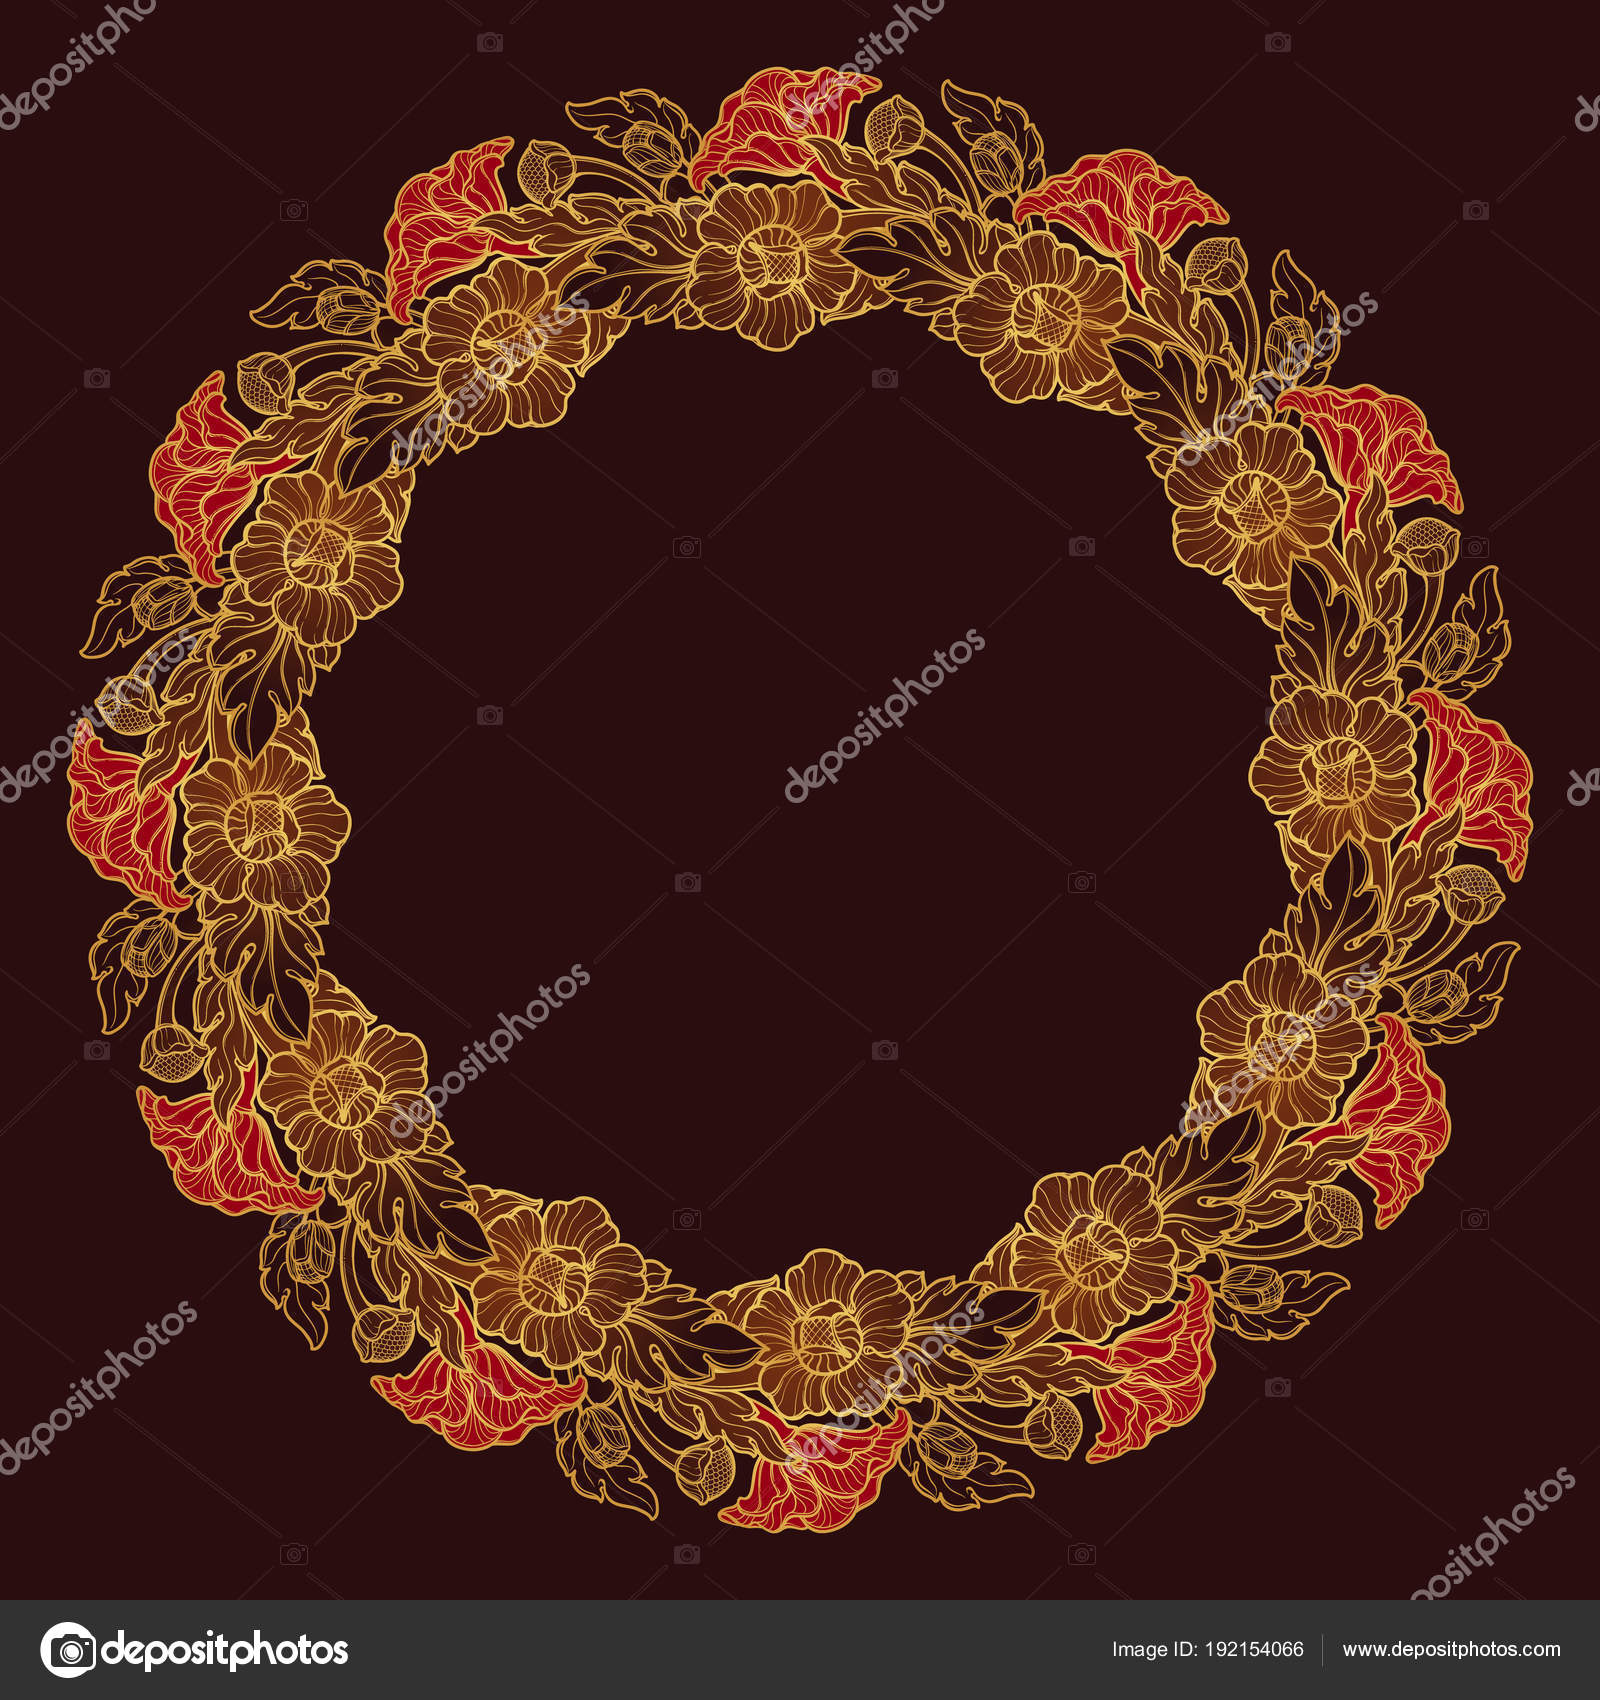 Lotus flowers arranged in intricate circular frame popular lotus flowers arranged in intricate circular frame popular decorative motif in south eastern asia mightylinksfo